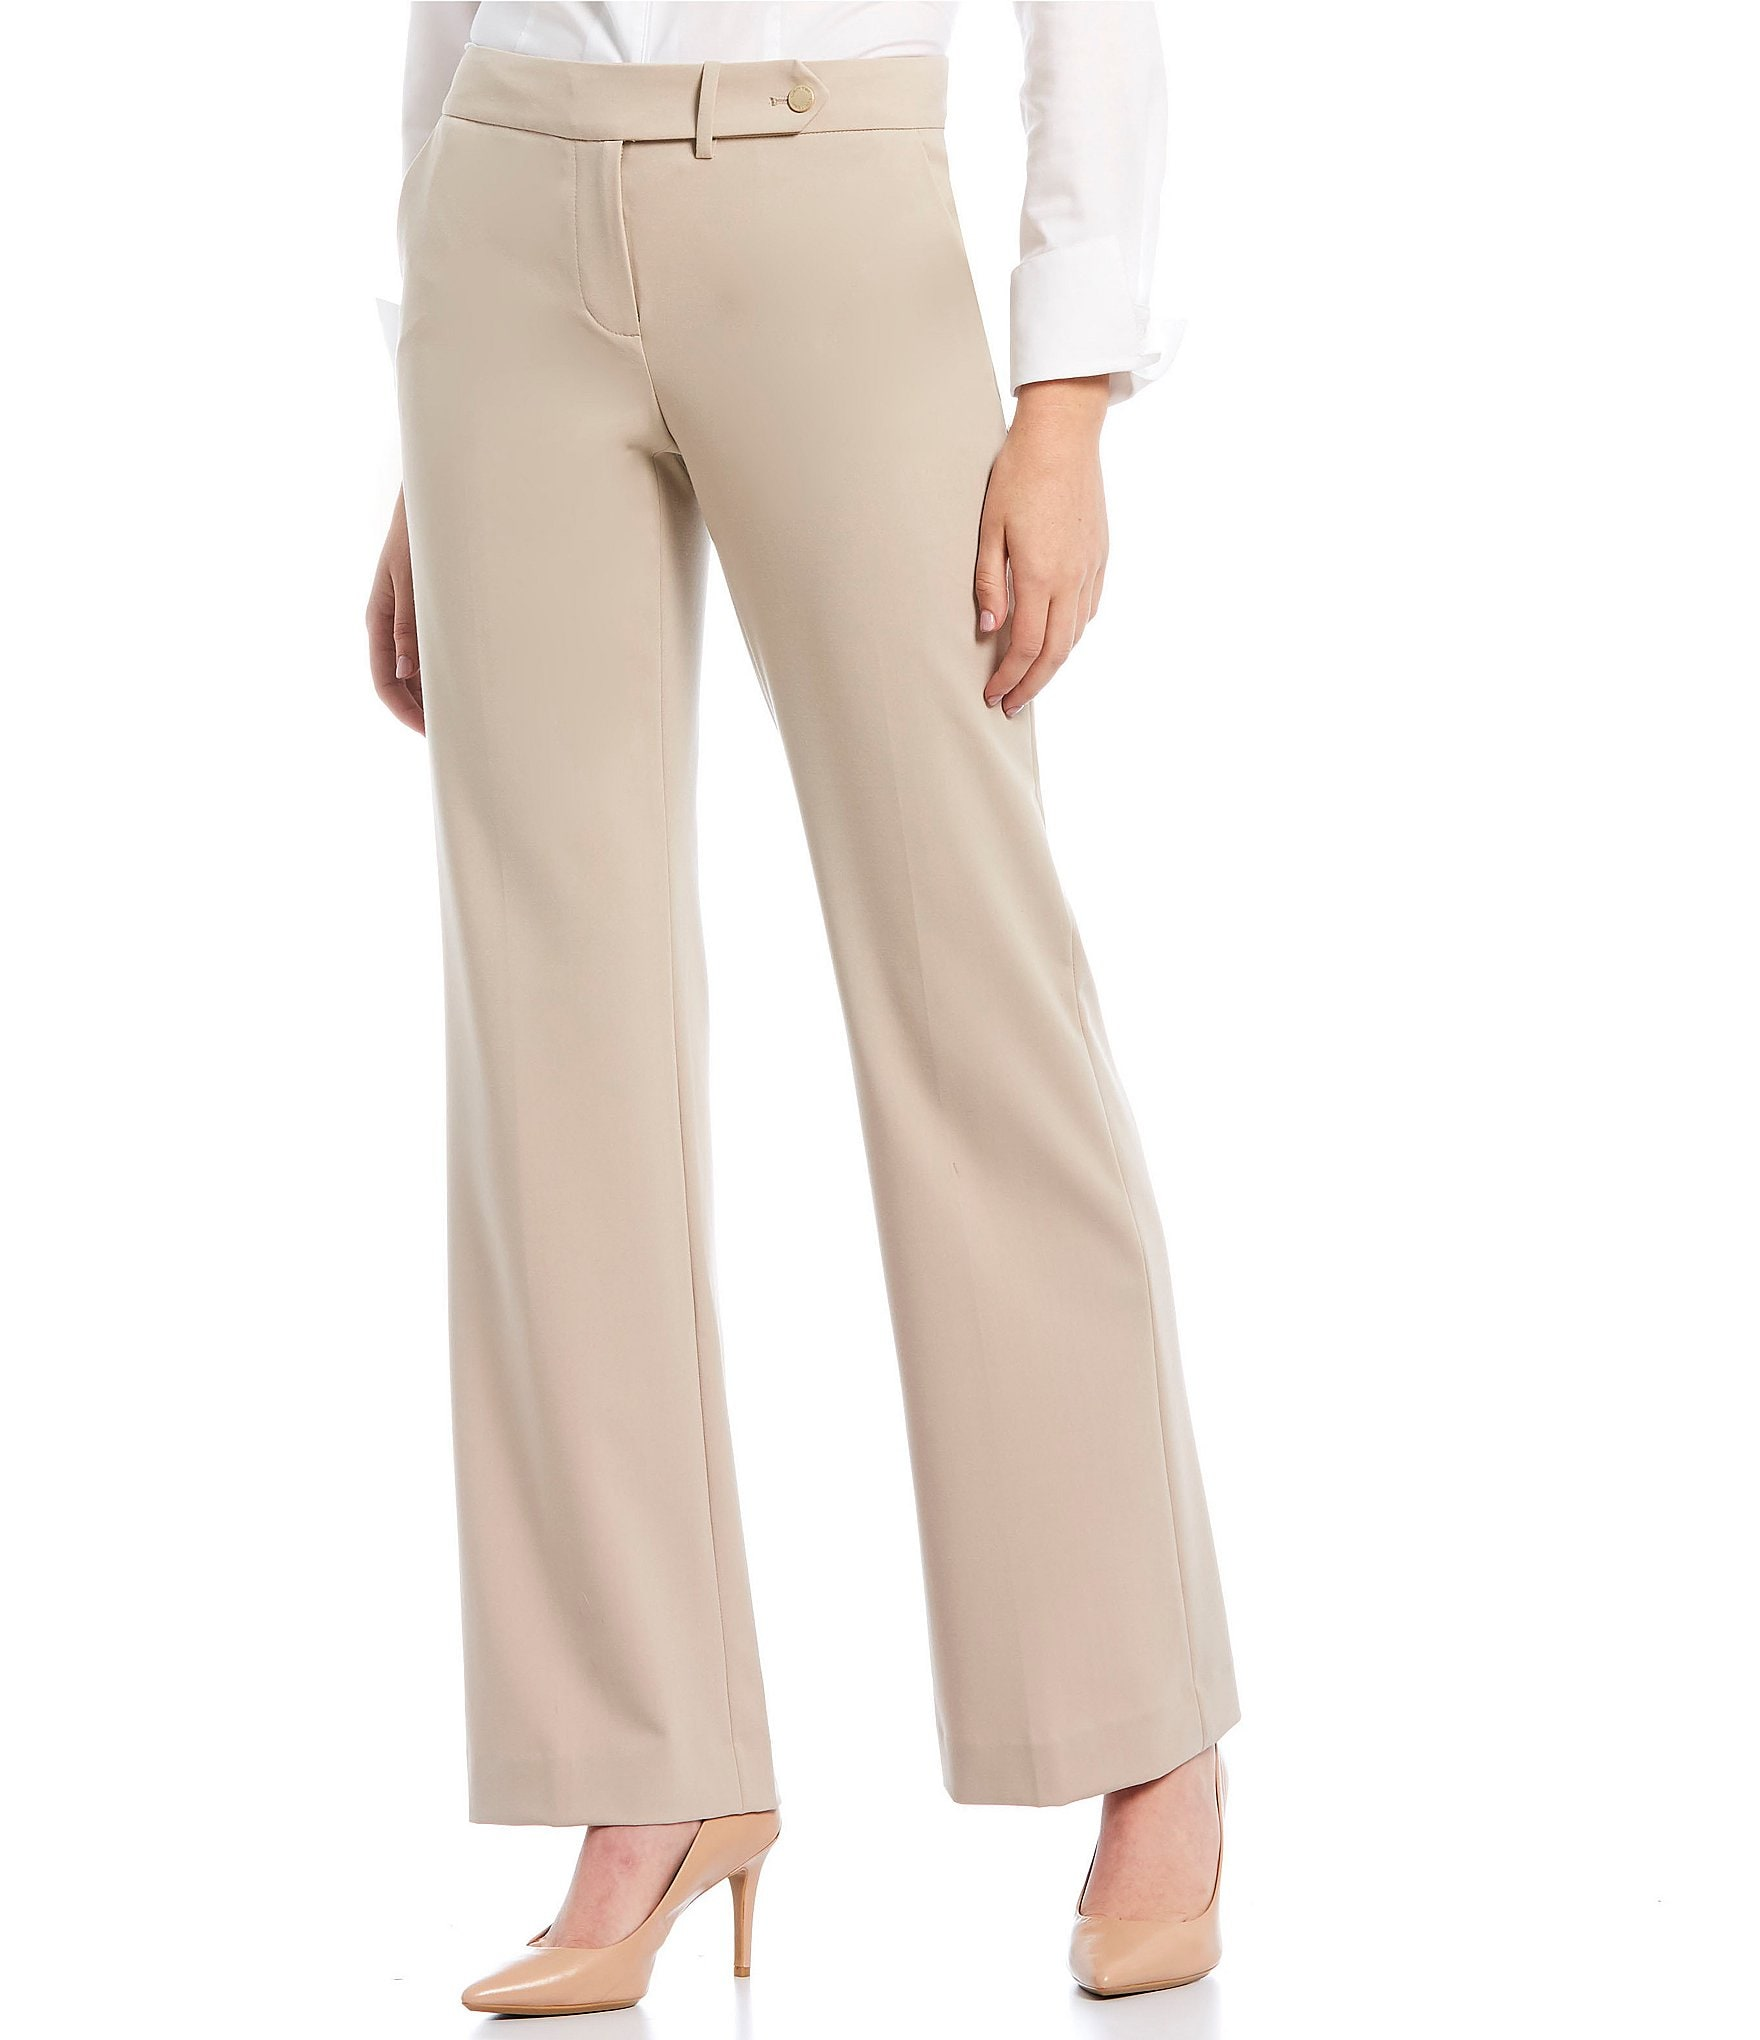 63f88601 slacks: Women's Petite Clothing | Dillard's